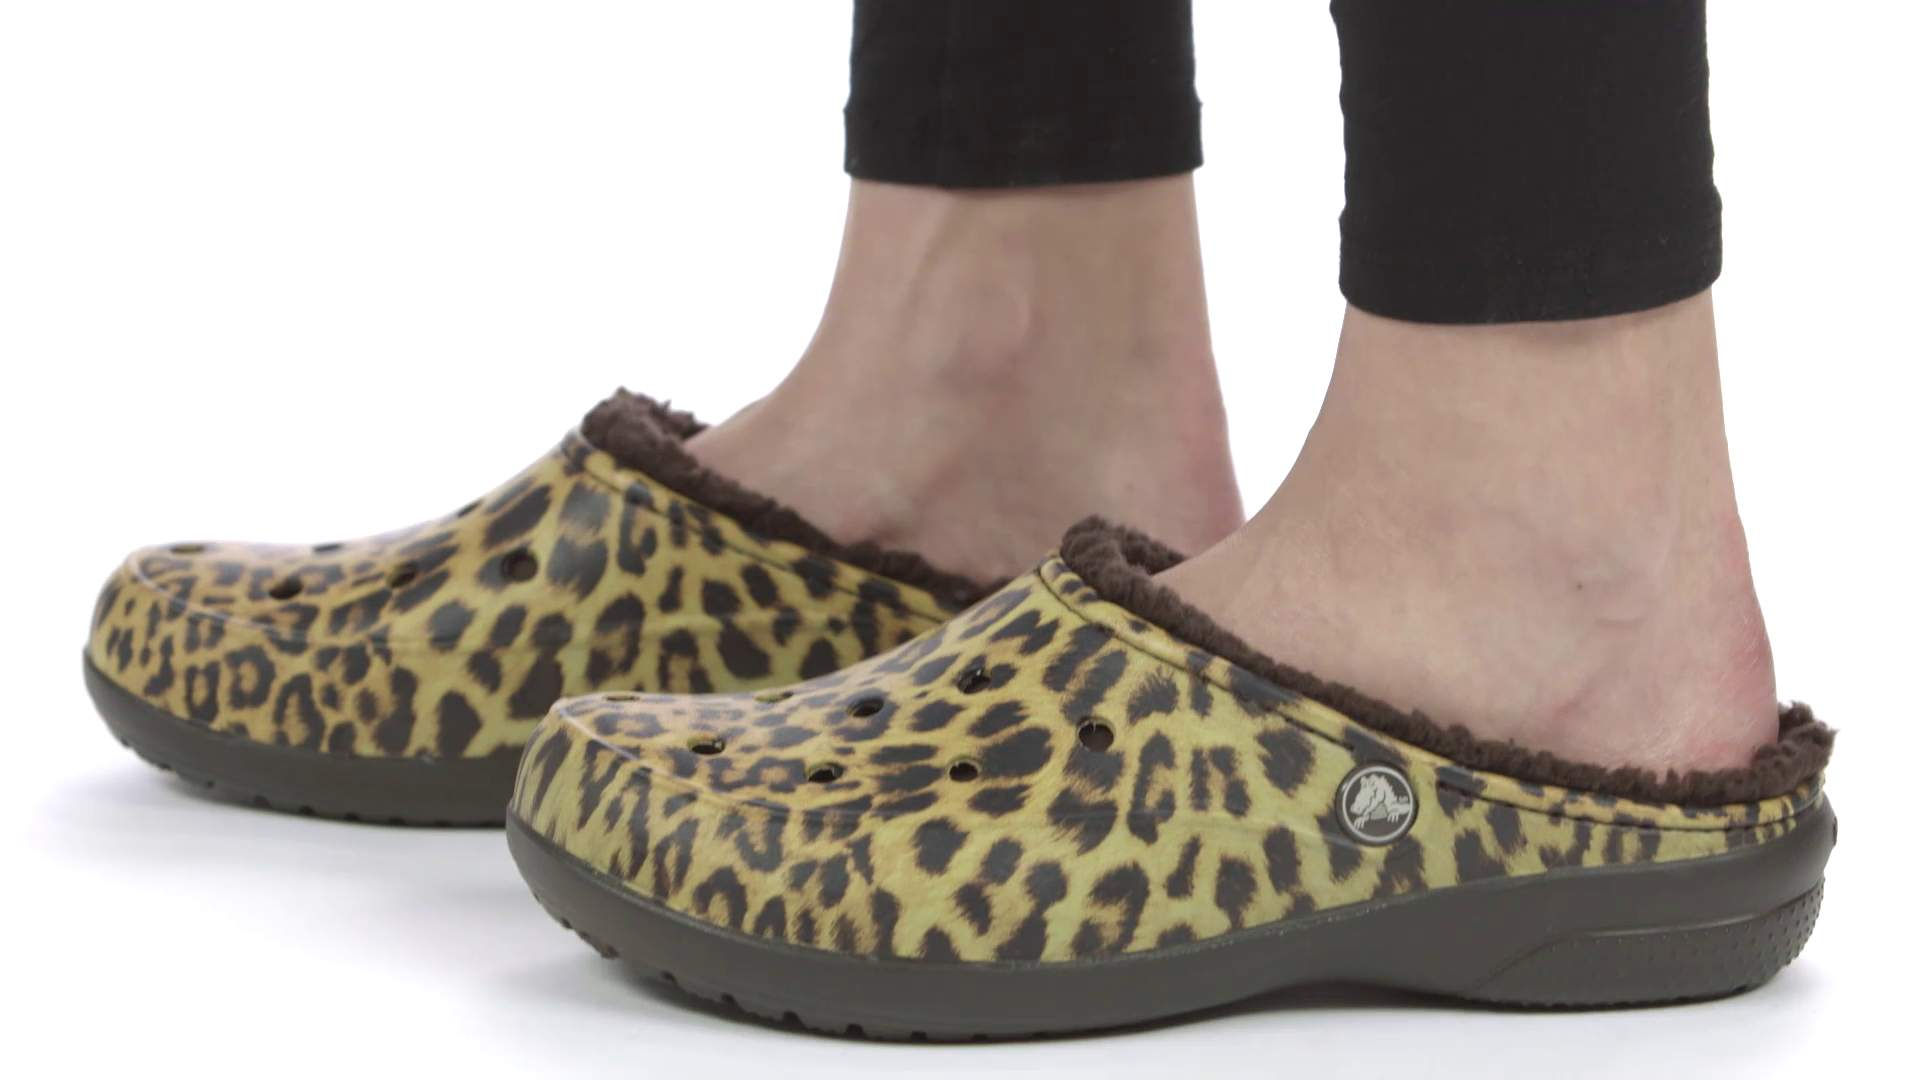 3249728f72b06e Women s Crocs Freesail Graphic Fuzz-Lined Clog - Crocs